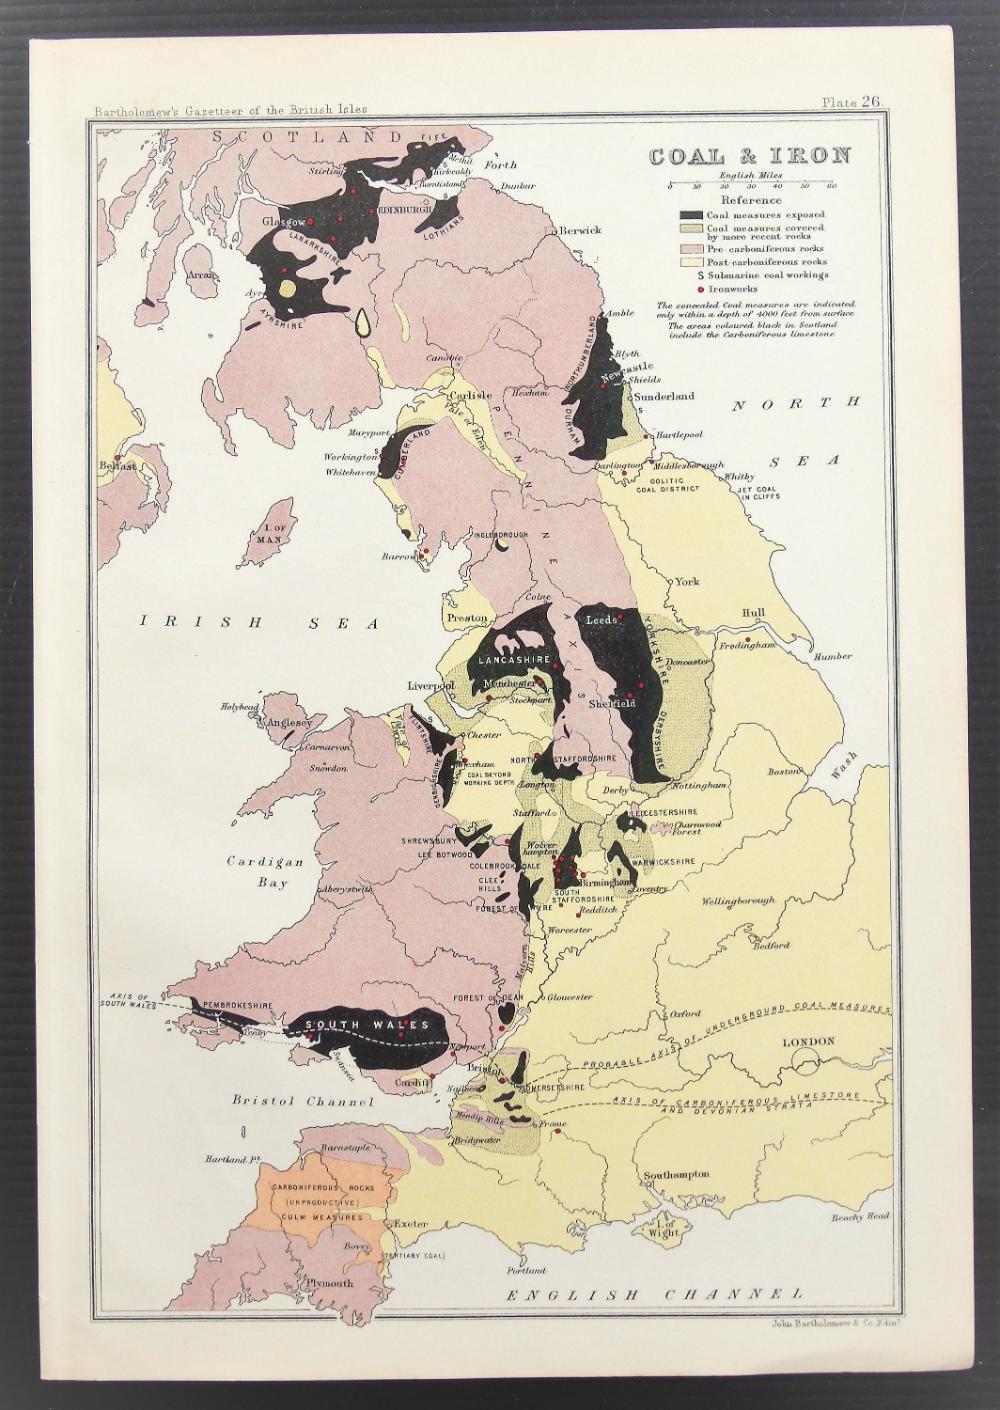 1904 British Isles Map of Coal & Iron Distribution, Antique Colour Map by Bartholomew, Pastel Colours #britishisles